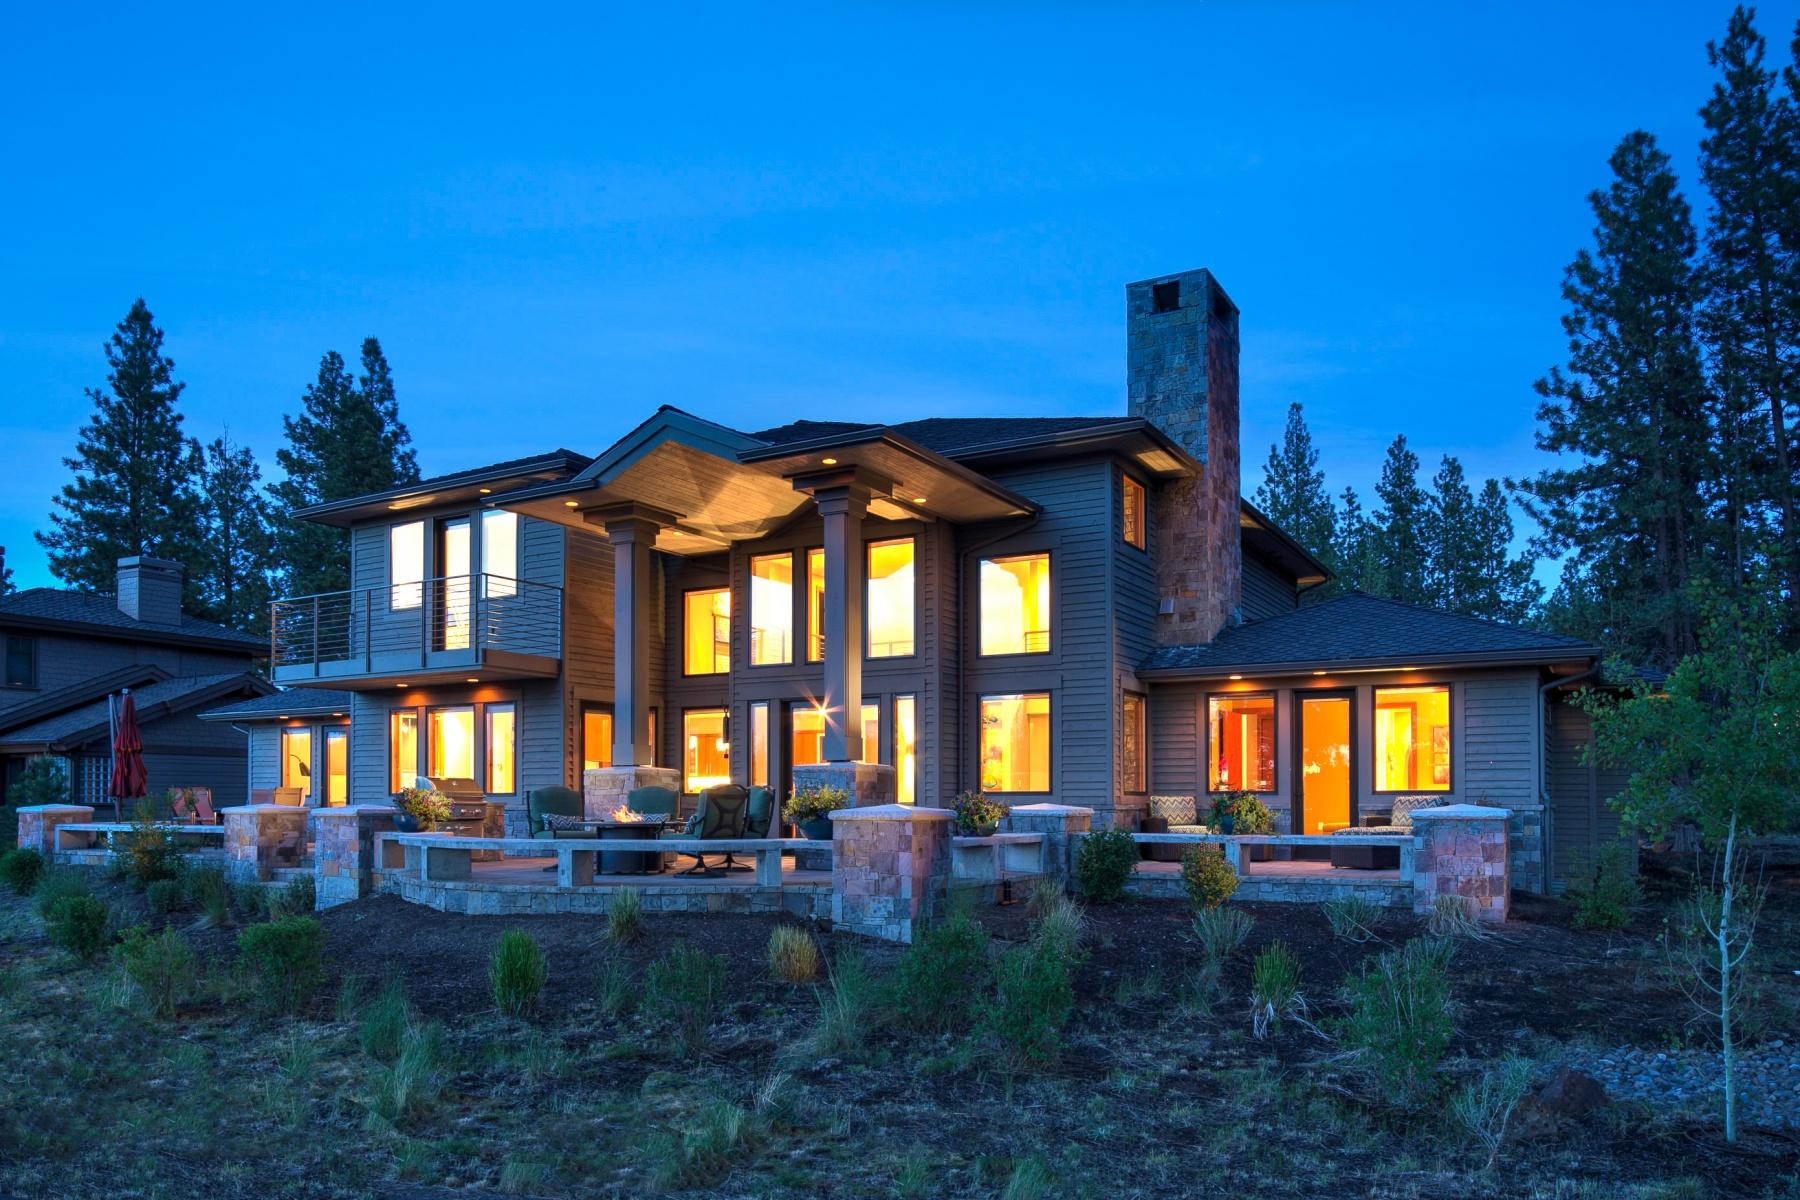 Single Family Home for Sale at 61451 Blurton, BEND 61451 Blurton Ct Bend, Oregon, 97702 United States